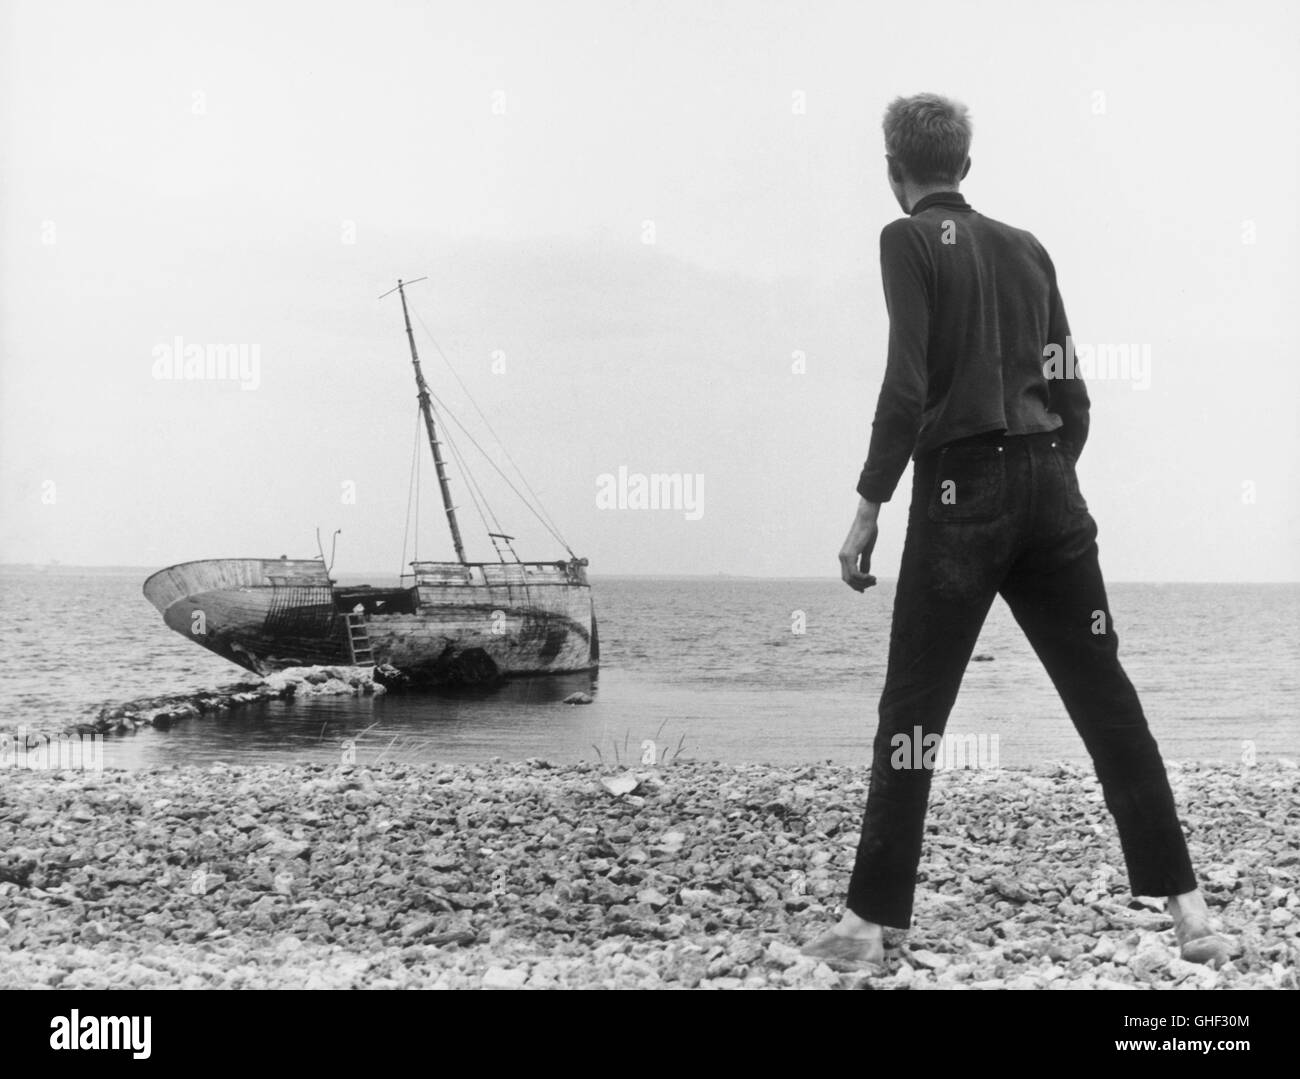 WIE IN EINEM SPIEGEL Sasom i en spegel Schweden 1961 Ingmar Bergman LARS PASSGARD (Fredrik/Minus), background: abandoned Stock Photo